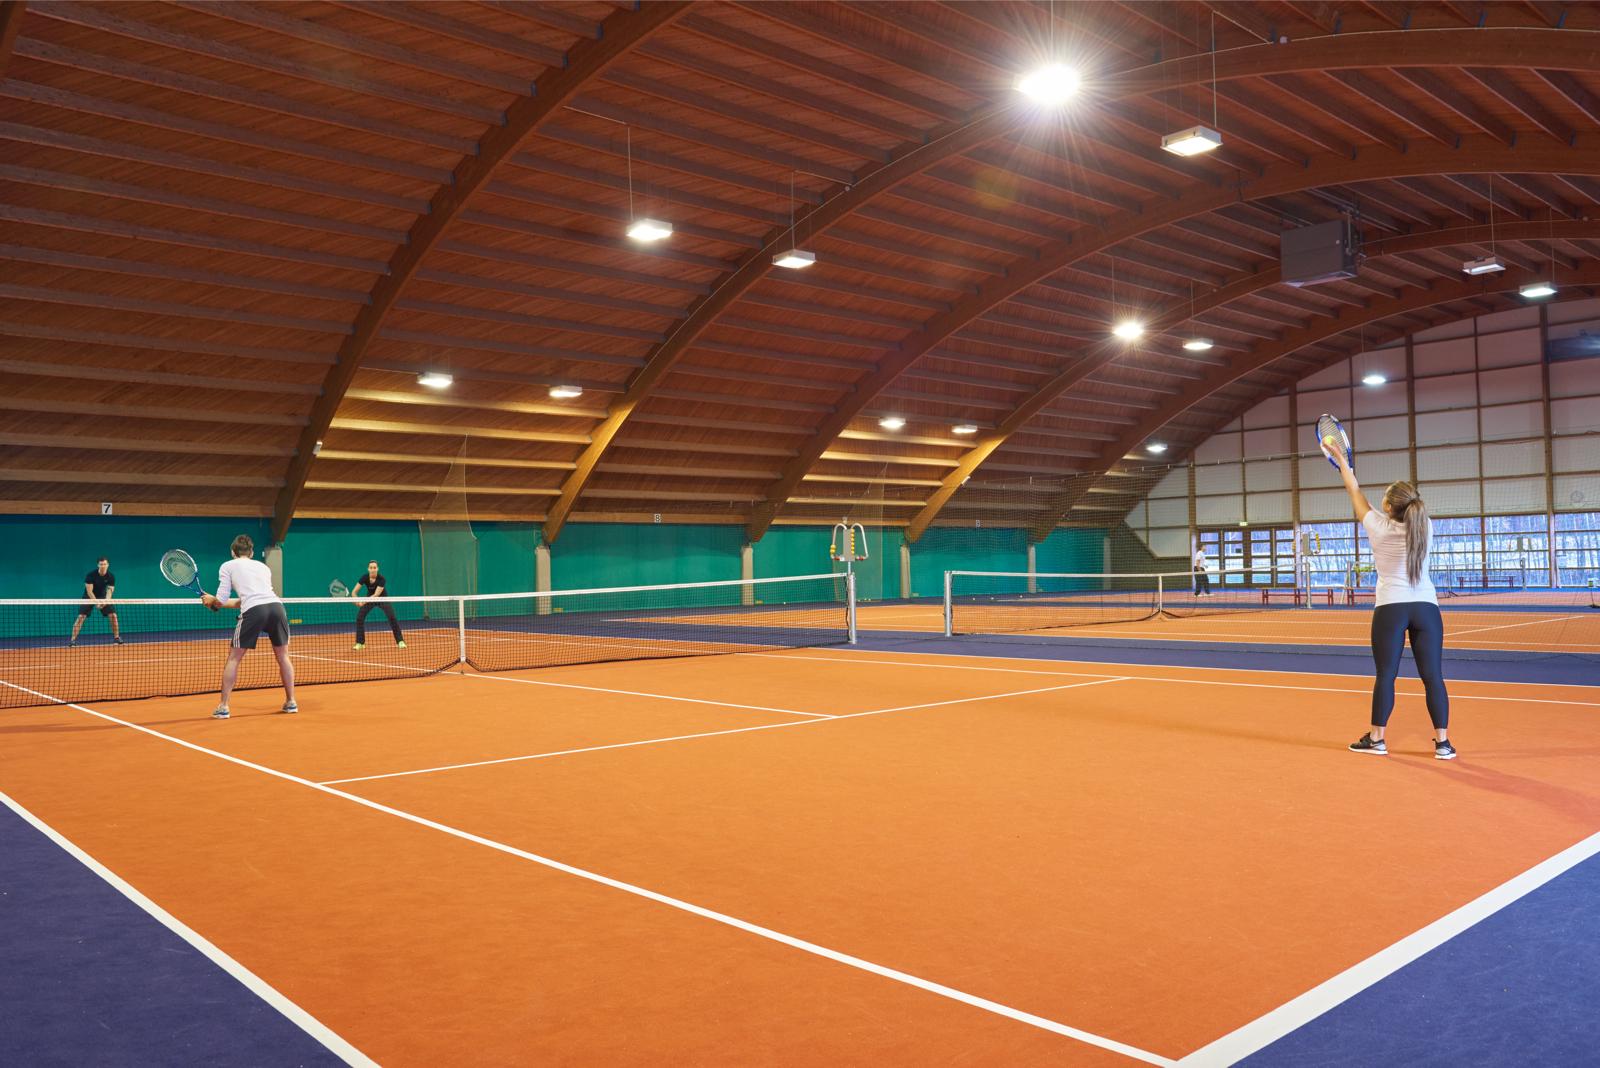 Members enjoying a game of tennis at David Lloyd Eindhoven